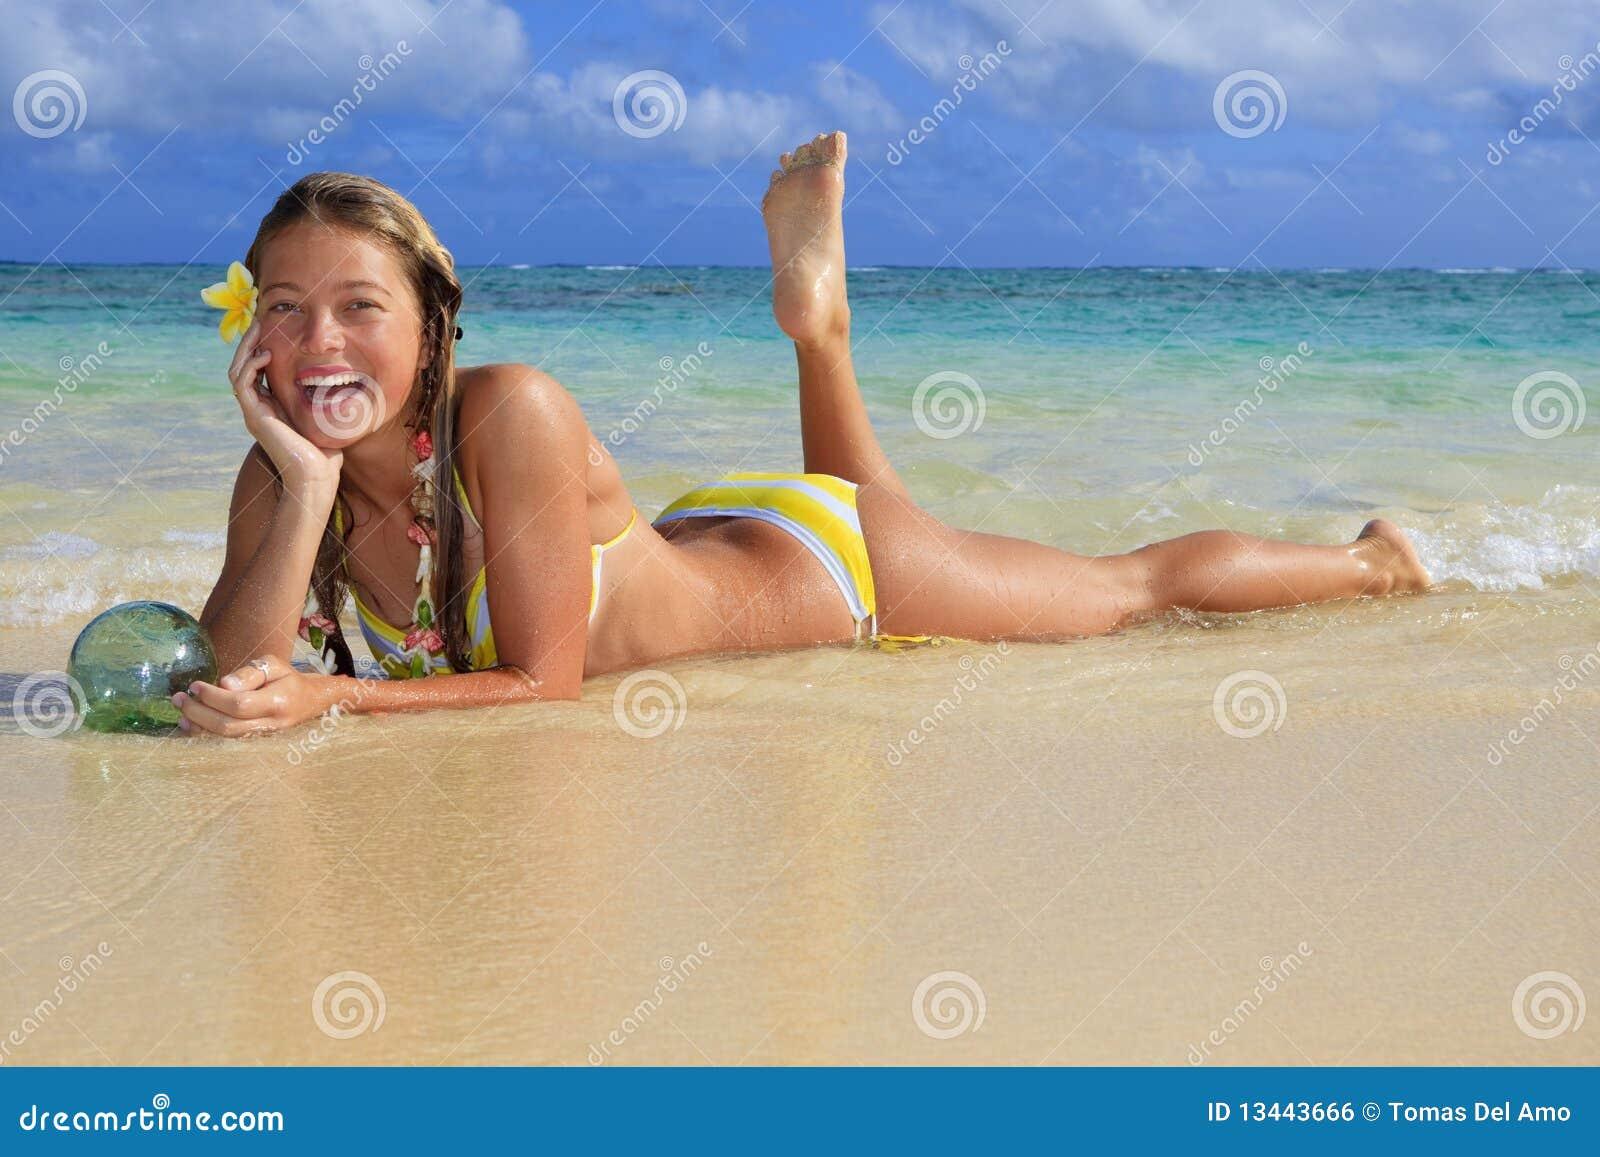 Royalty Free Stock Image: Teenage girl in the ocean in hawaii